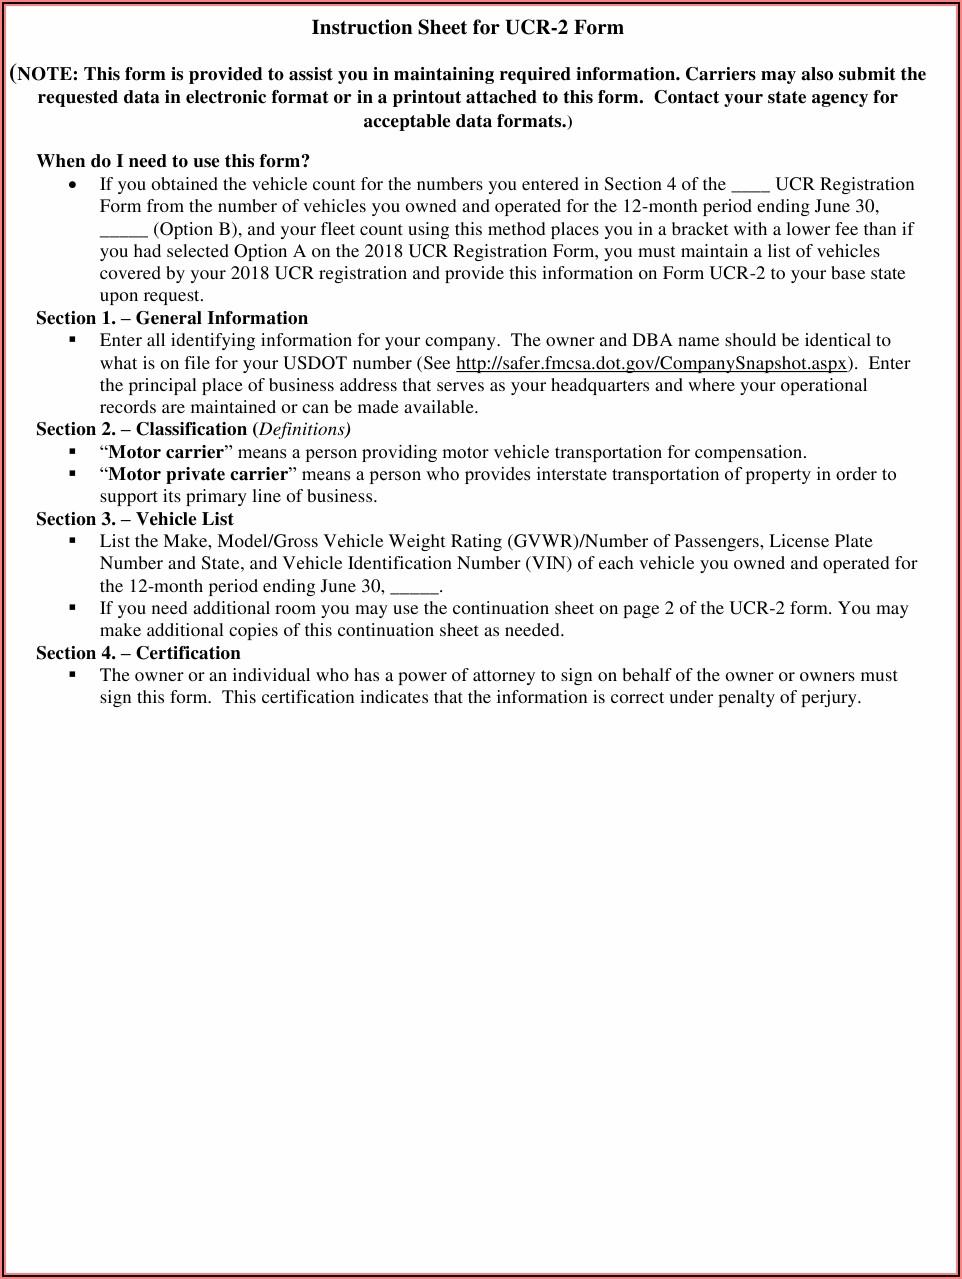 Unified Carrier Registration Form Ucr 2